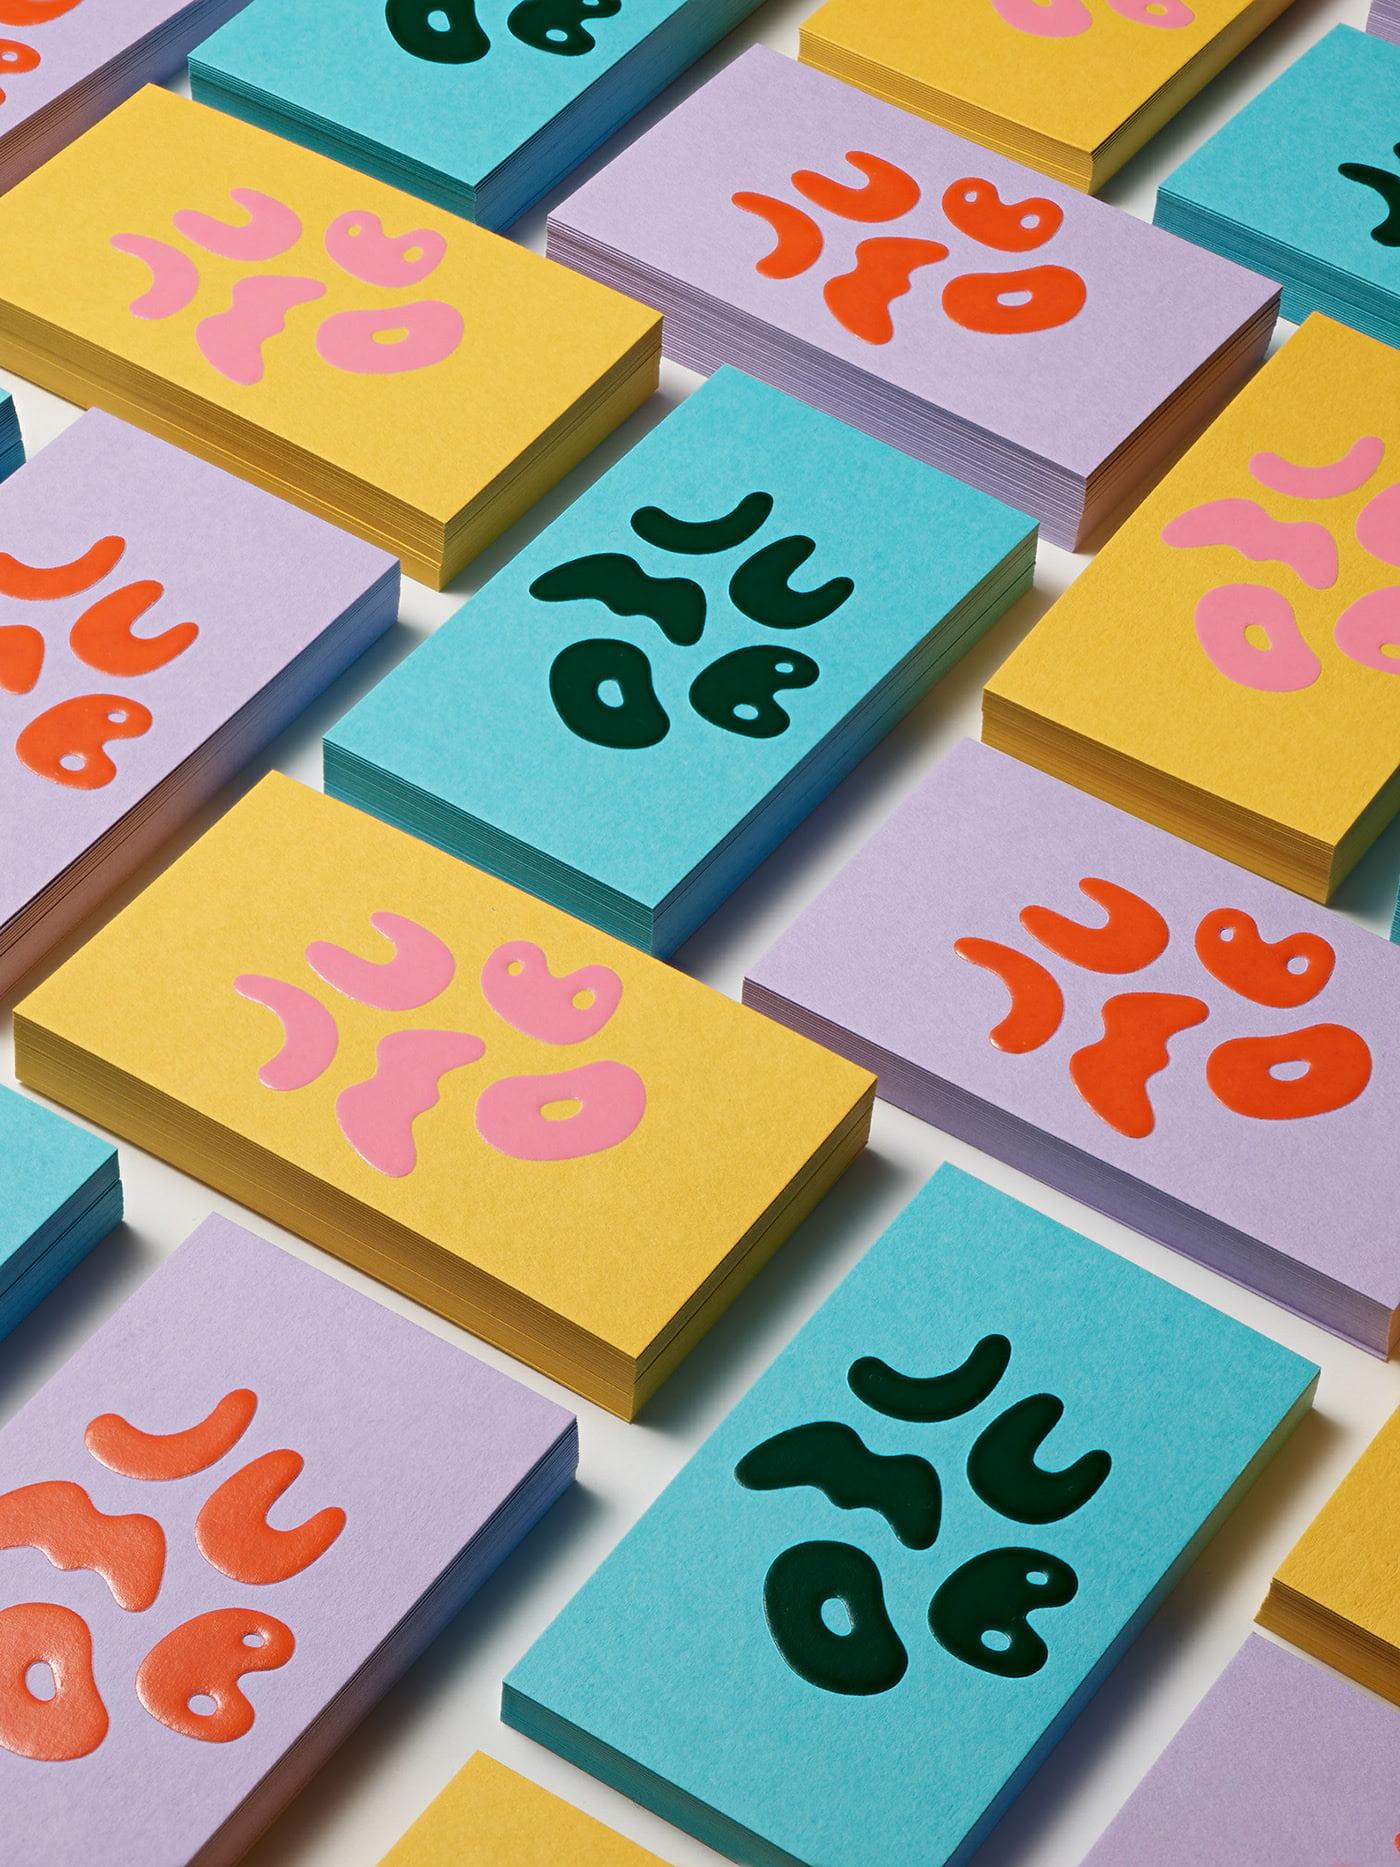 Jumbo-Logo - 53+ FREE Typographic Business Cards IDEA [year]